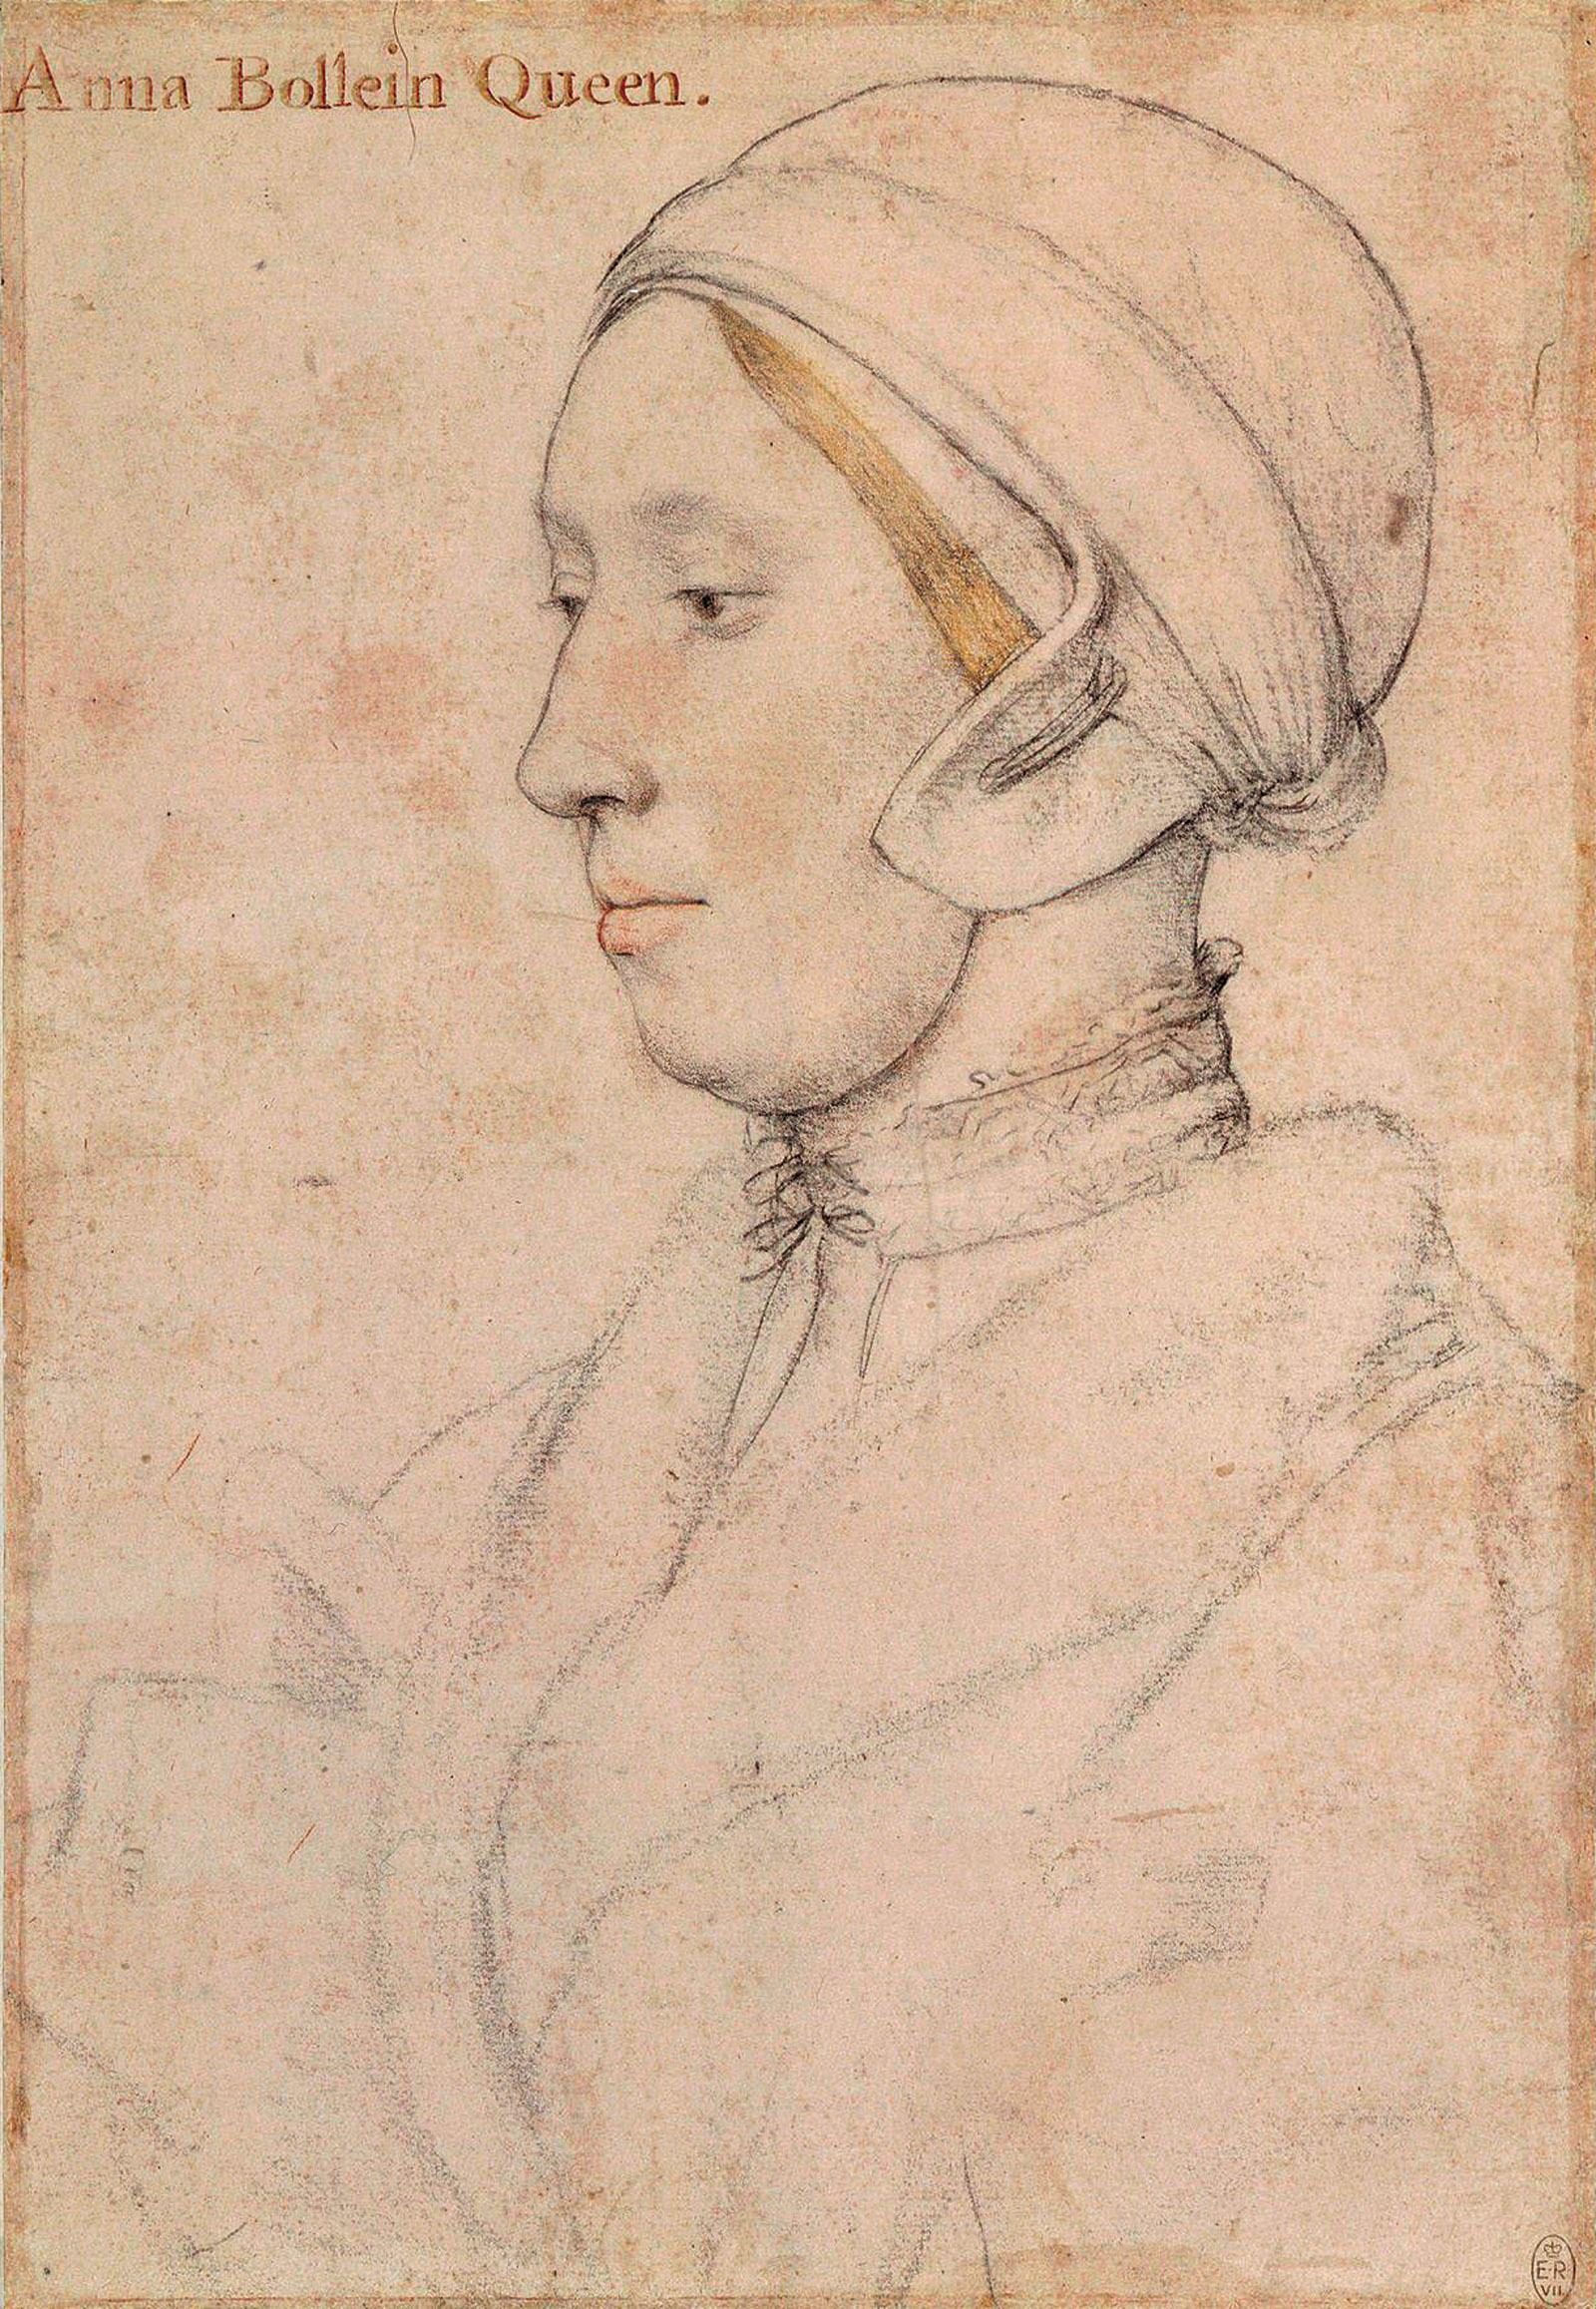 Anne Boleyn; drawing by Hans Holbein the Younger, circa 1533–1536